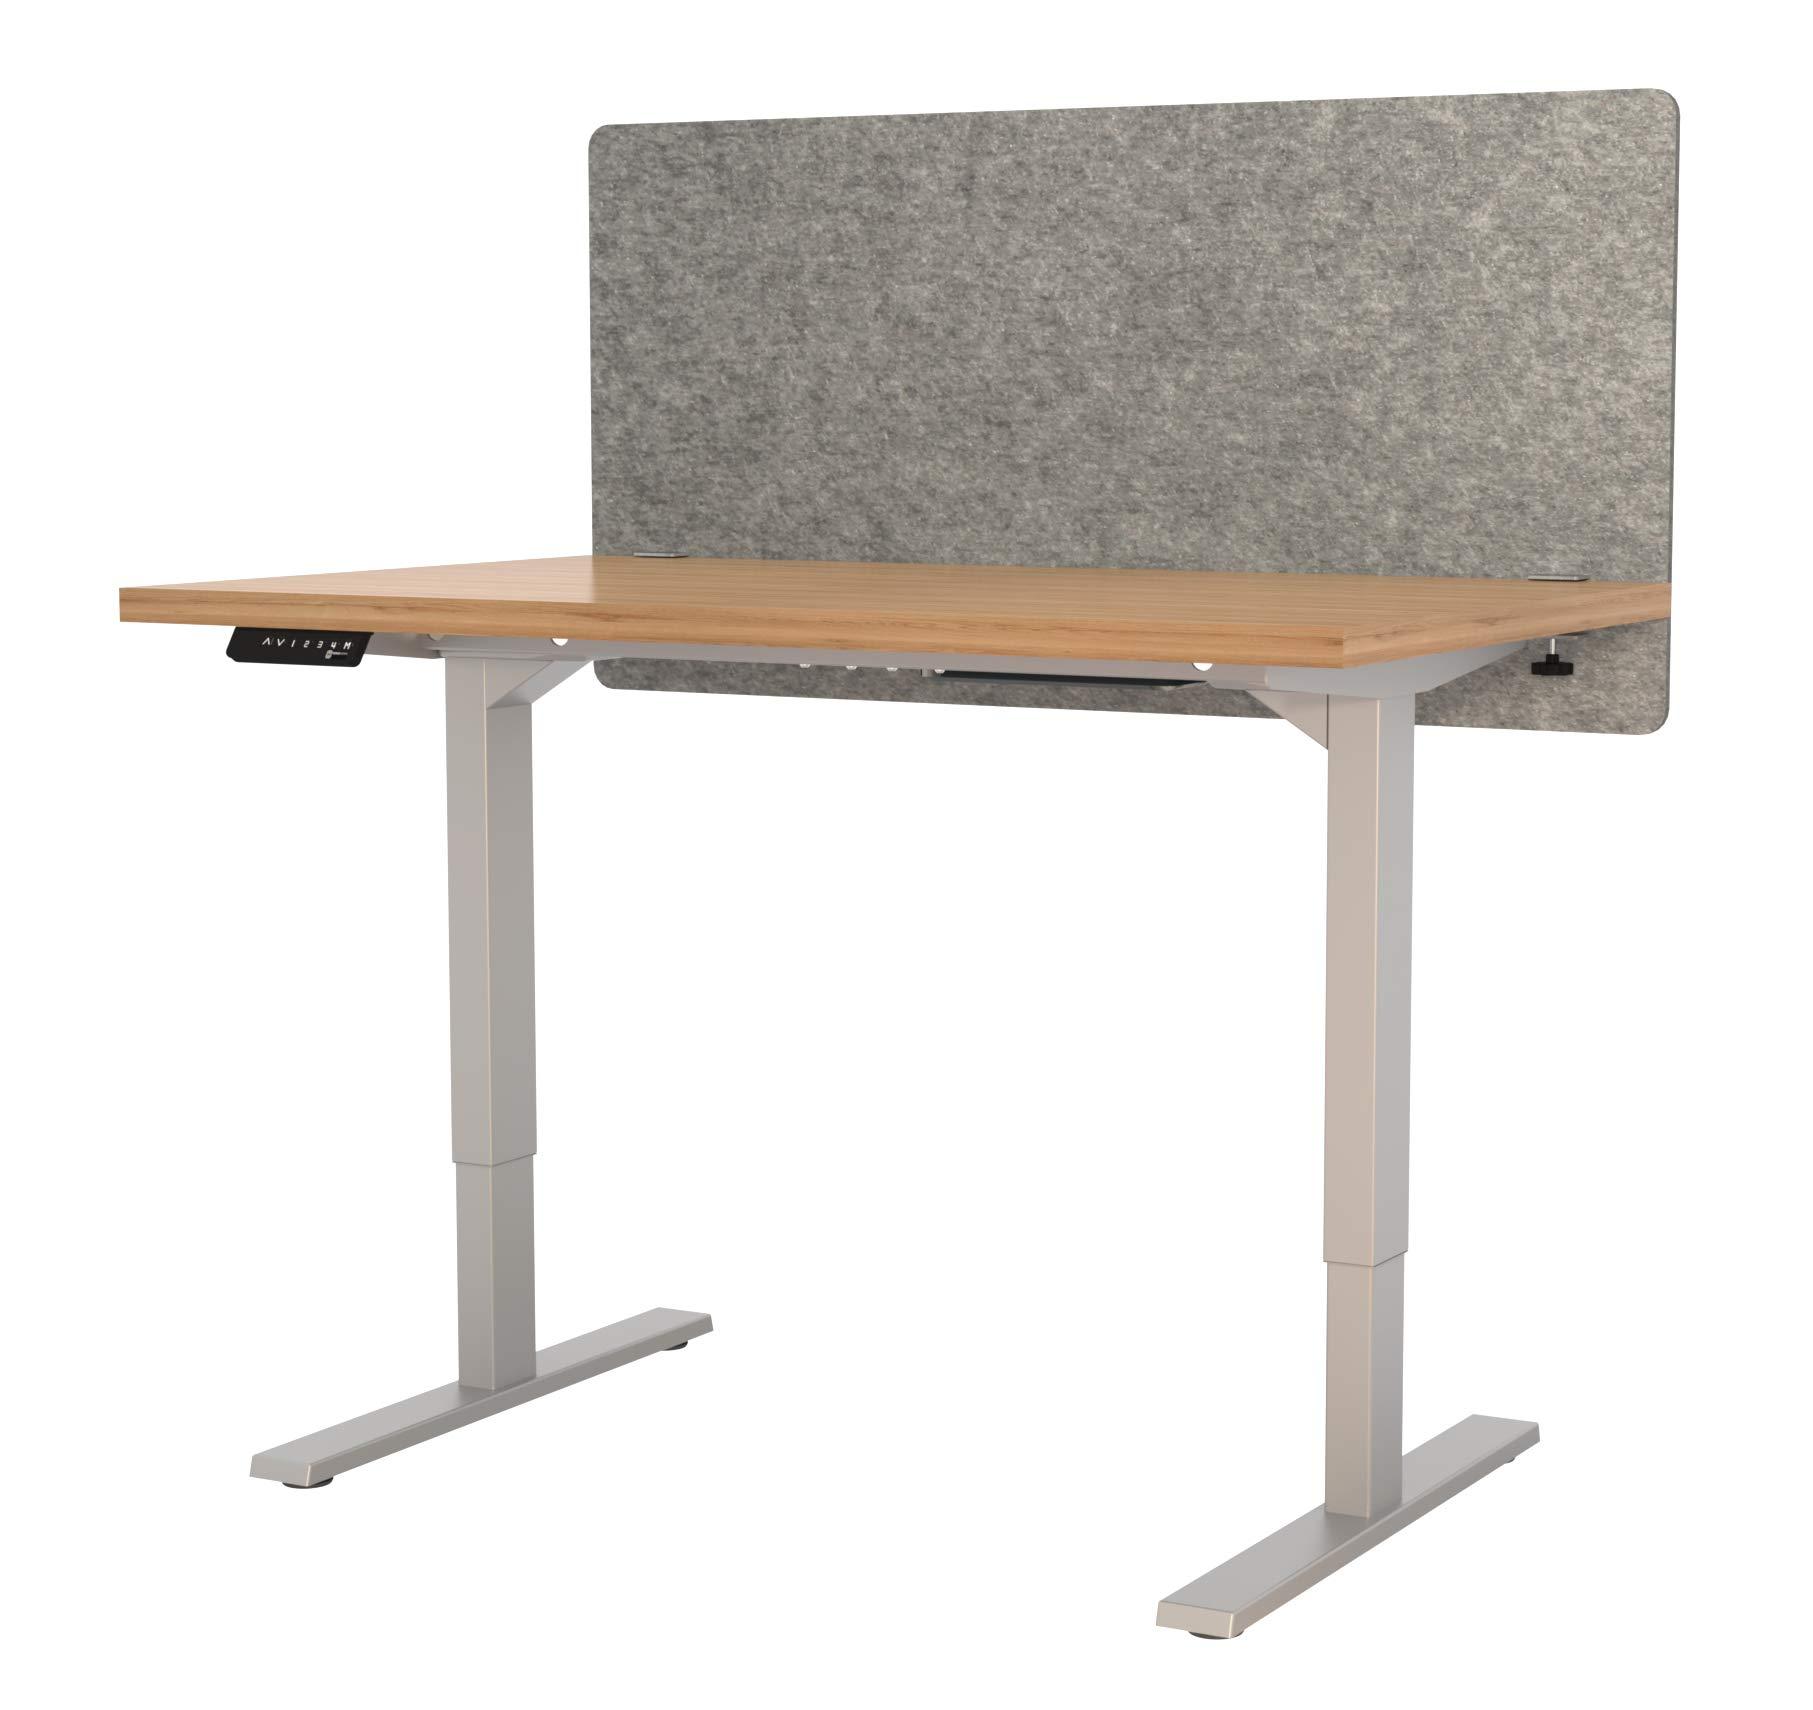 "VaRoom Acoustic Partition, Sound Absorbing Desk Divider – 48"" W x 24""H Privacy Desk Mounted Cubicle Panel, Ash Grey by VaRoom (Image #2)"